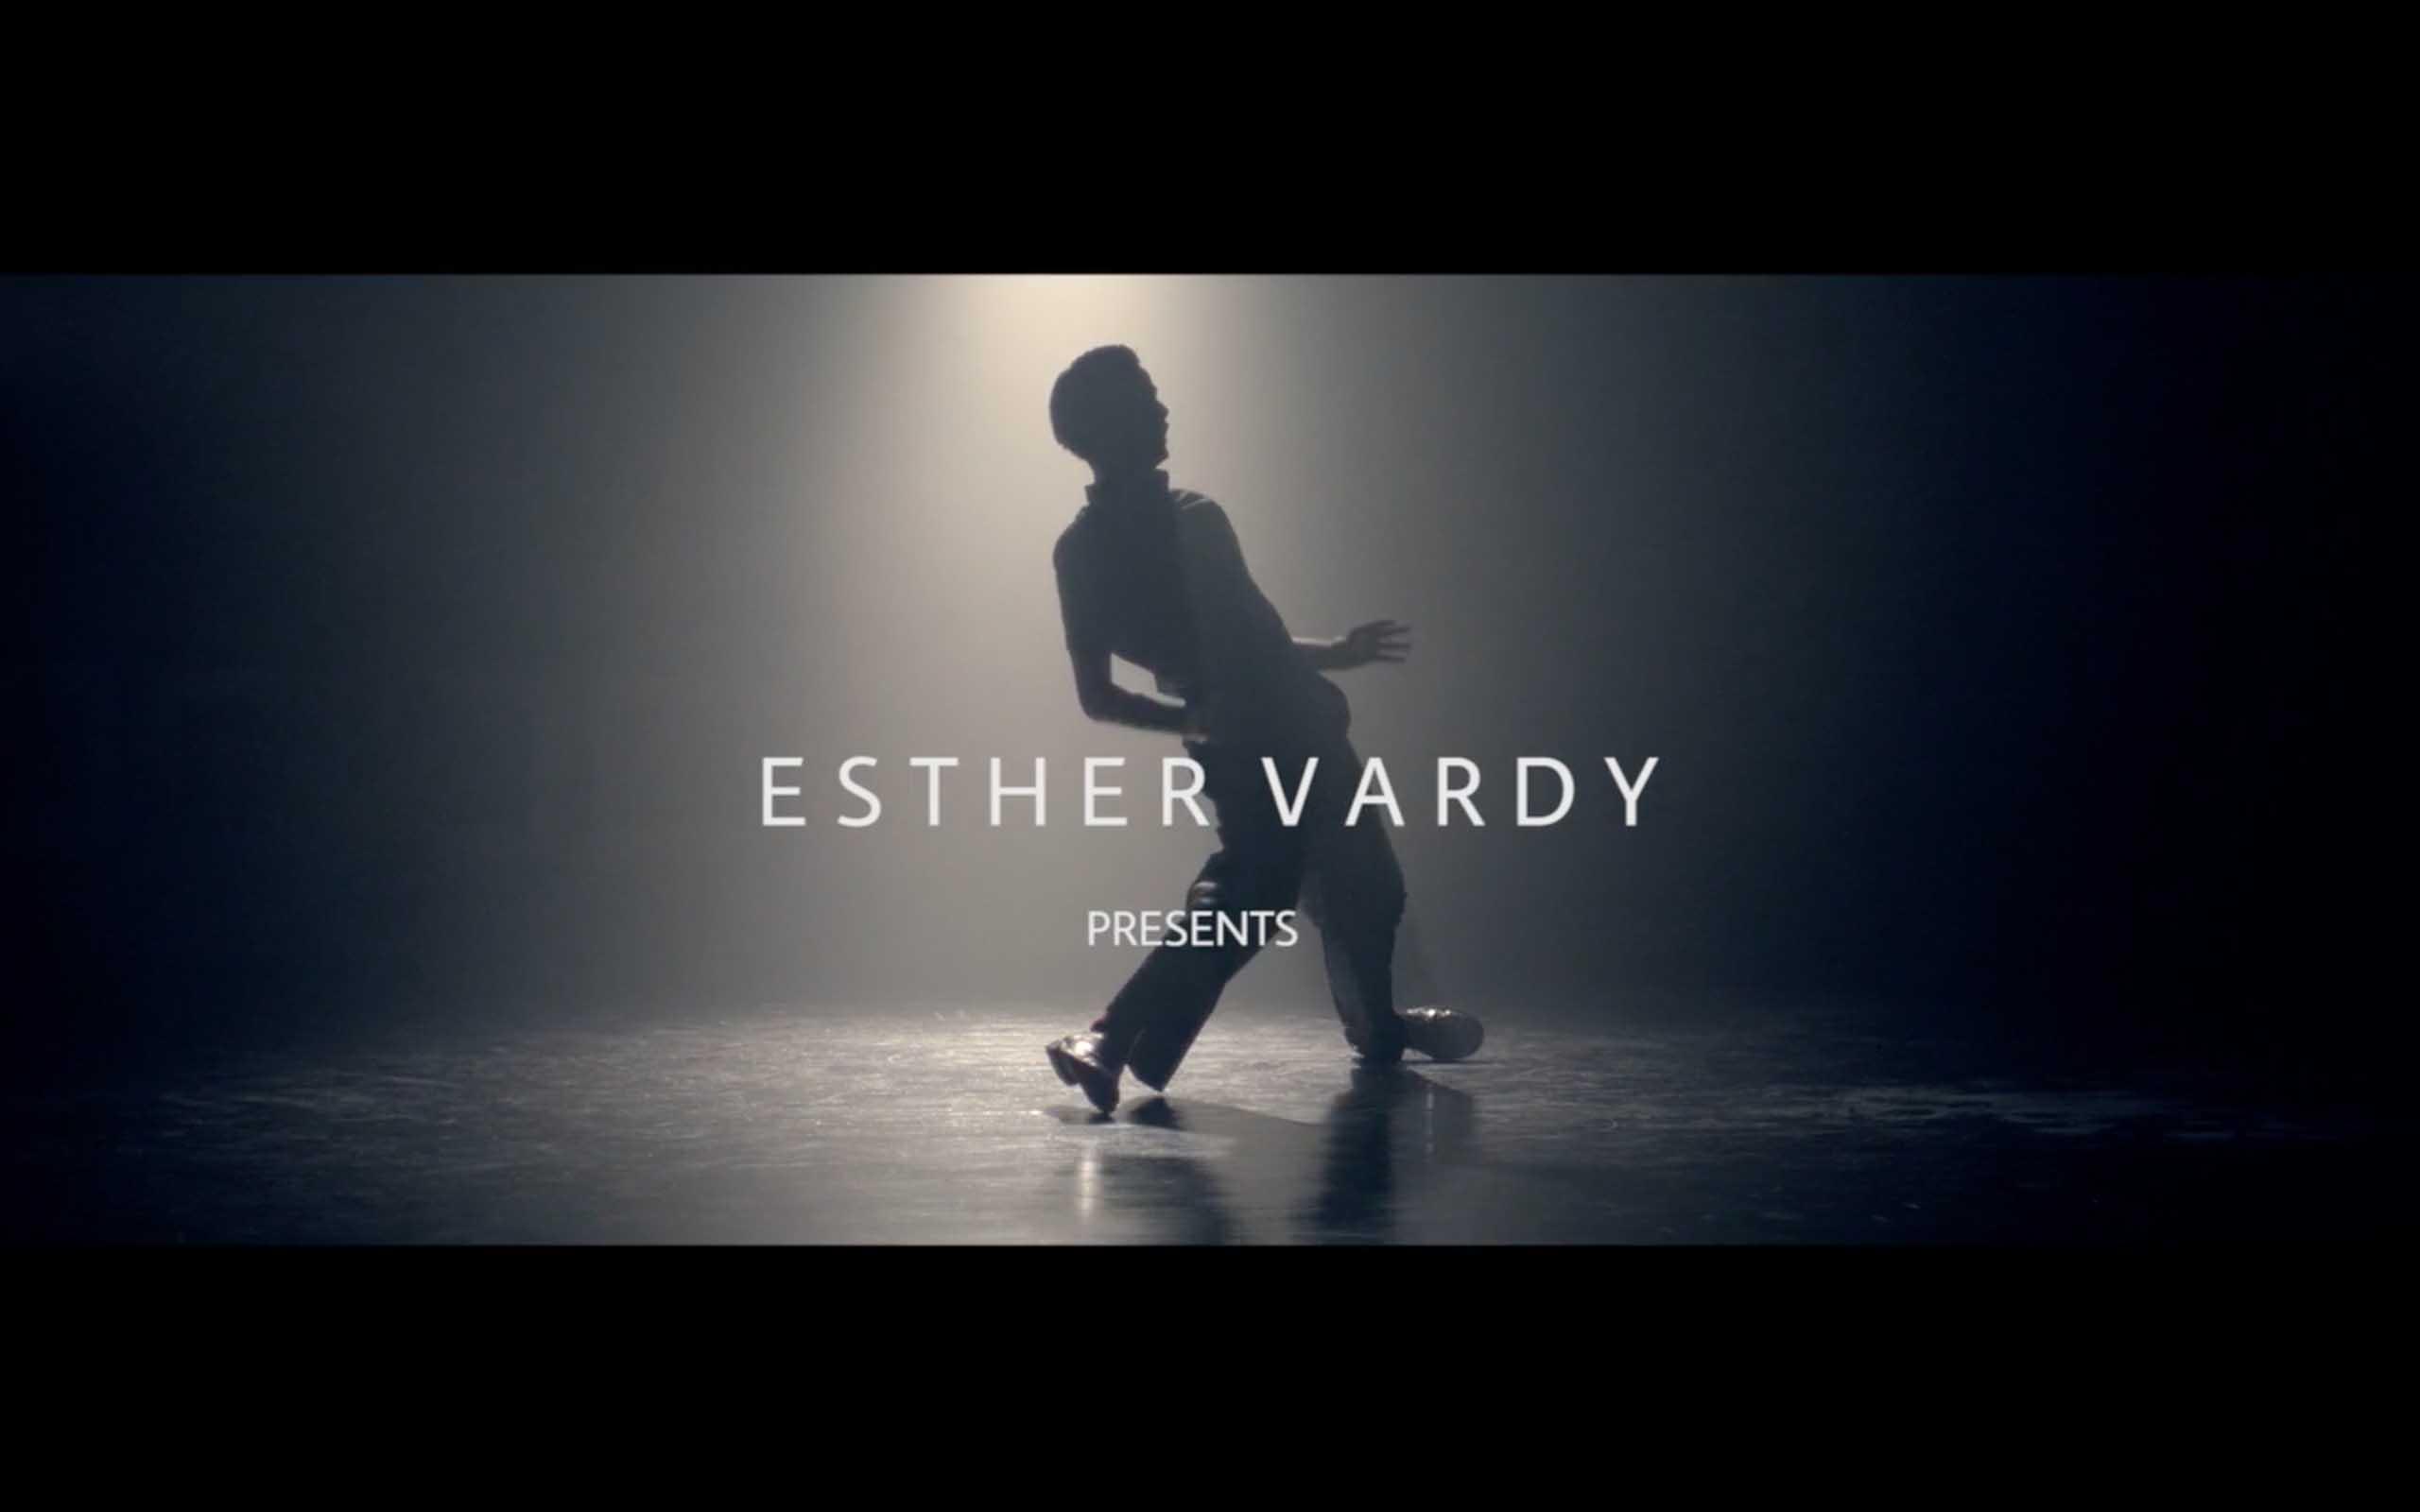 TEAM: ESTHER VARDY